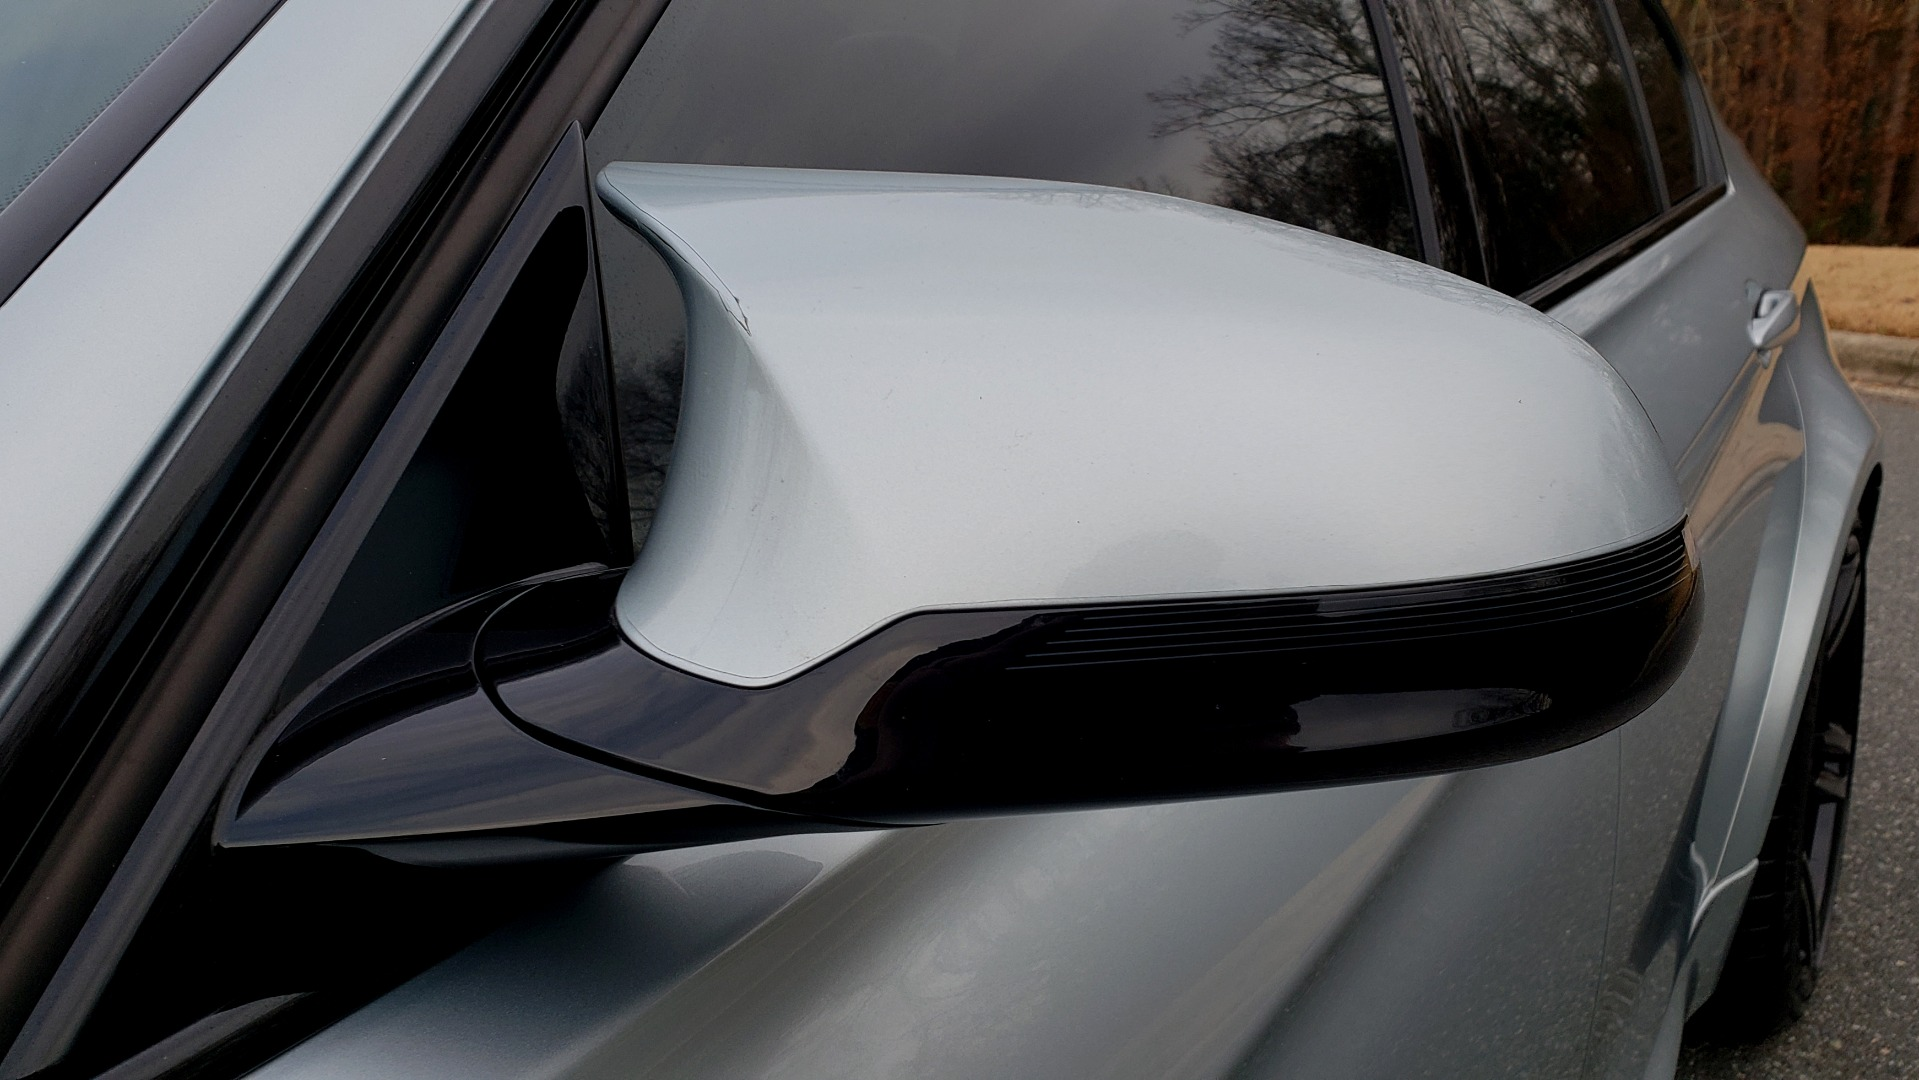 Used 2015 BMW M3 EXECUTIVE PKG / NAV / CAMERA / HUD / CARBON FIBER ROOF for sale Sold at Formula Imports in Charlotte NC 28227 31